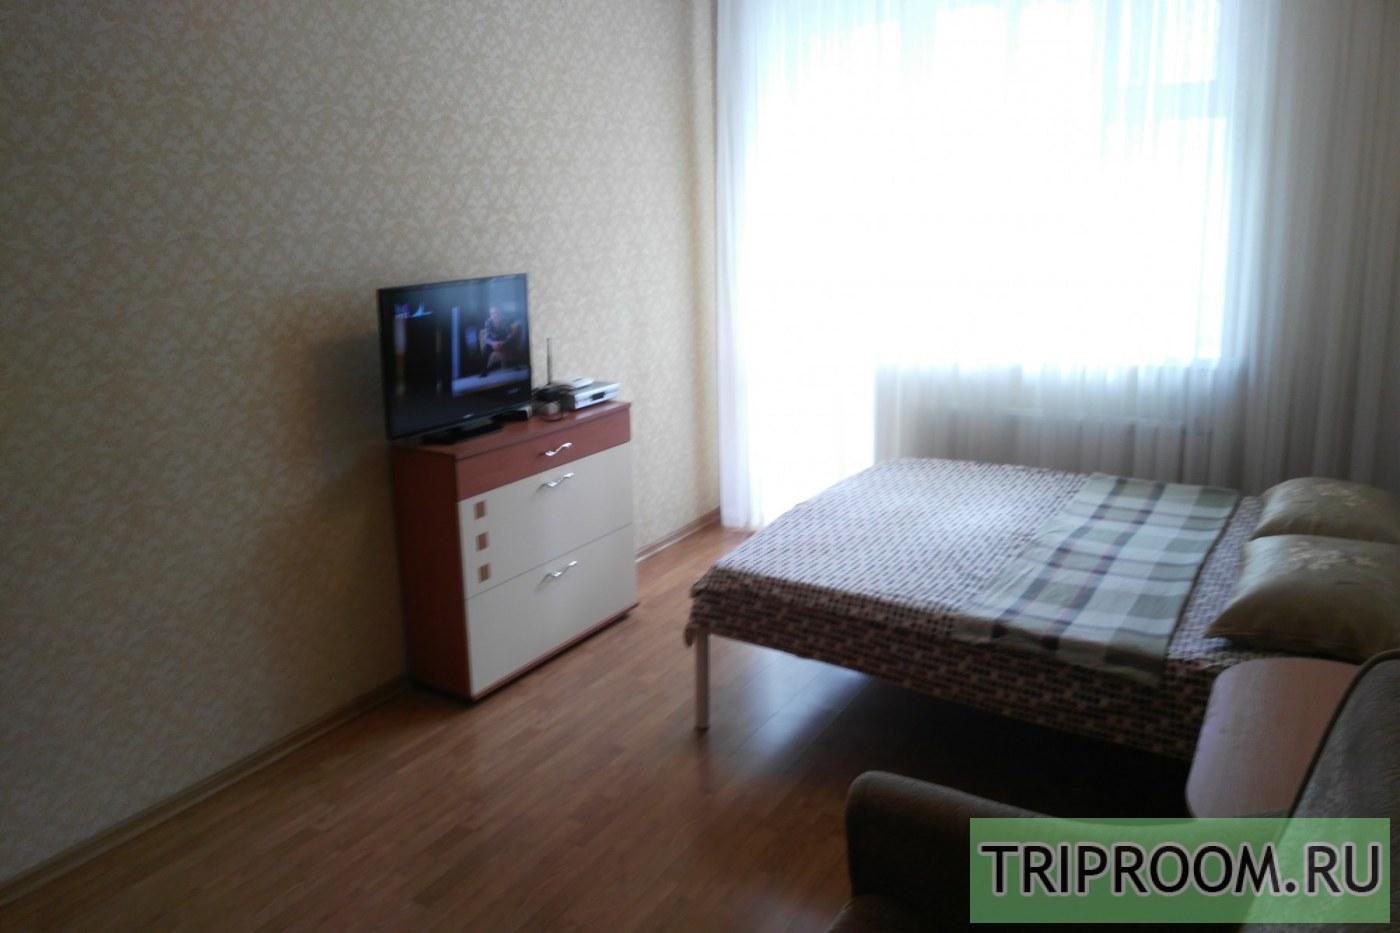 1-комнатная квартира посуточно (вариант № 38995), ул. Лексина улица, фото № 5